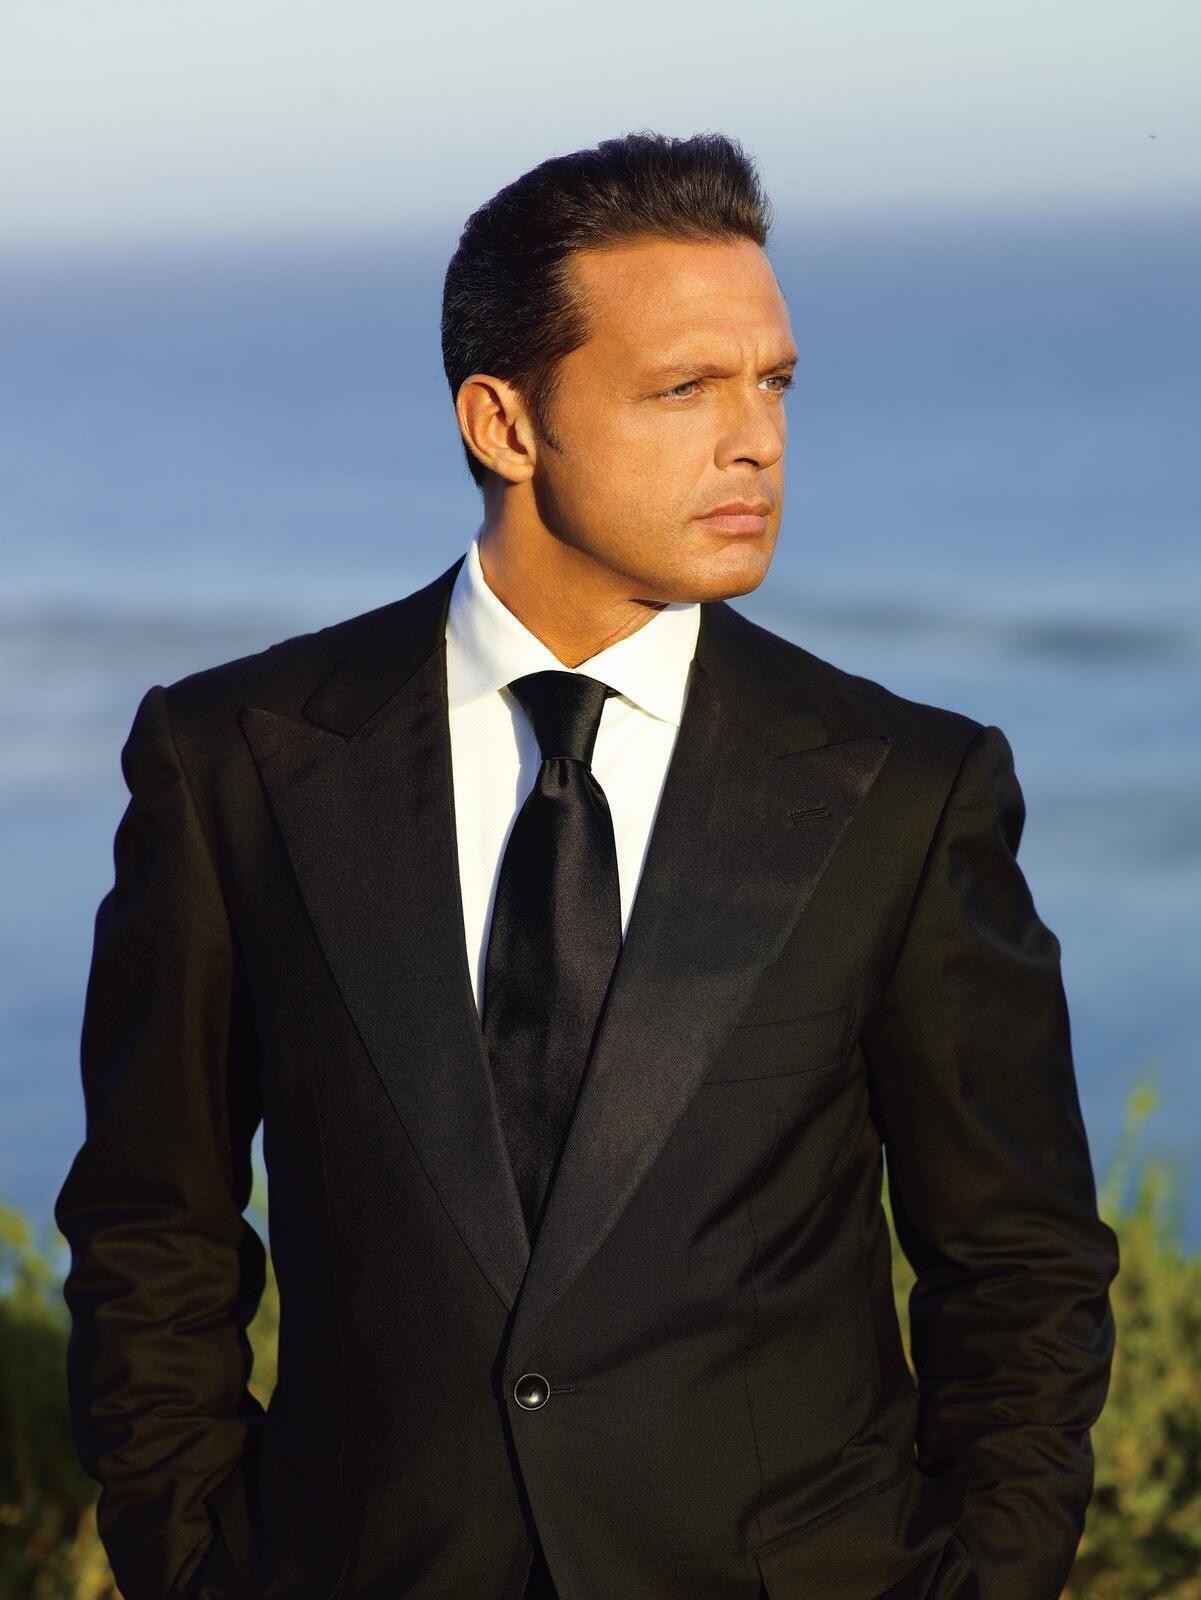 Historia de un Amor là một trong những bài hát tủ của Luis Miguel, ông hoàng bolero (DR)